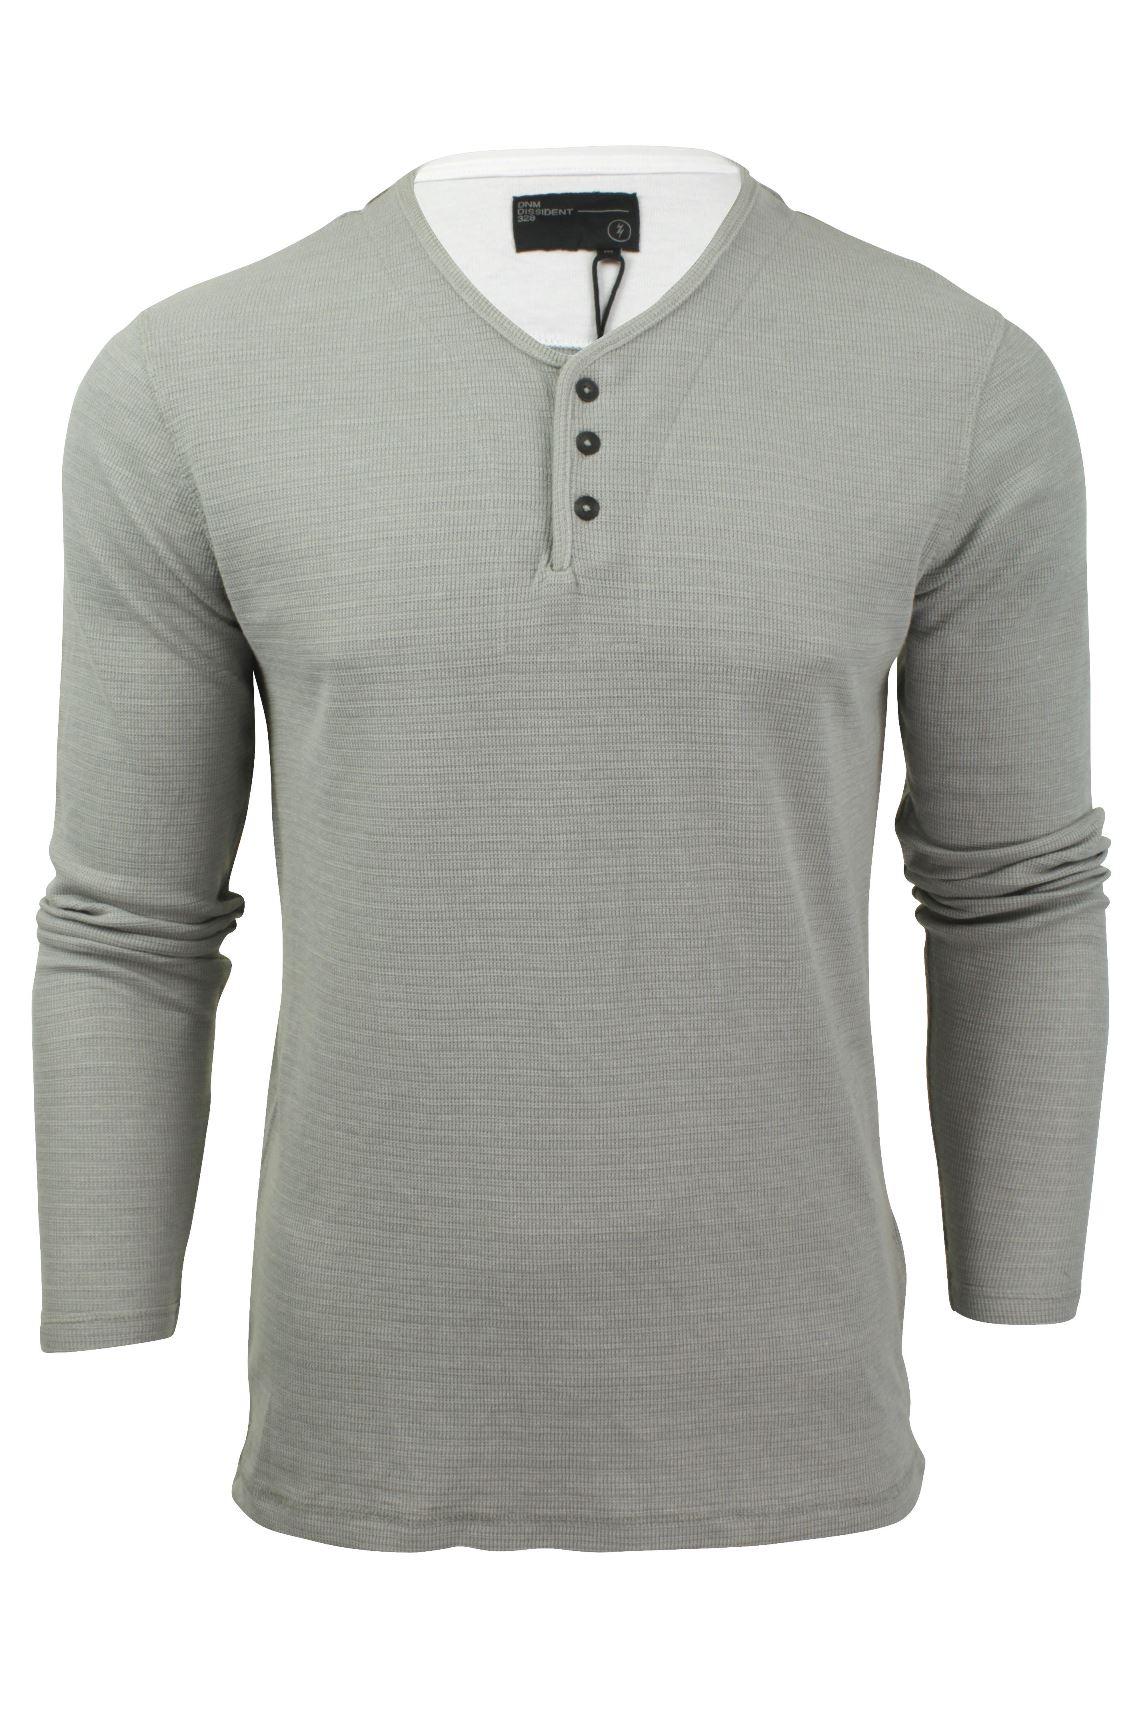 Mens-Long-Sleeved-T-Shirt-by-Dissident-039-Espino-039 thumbnail 6